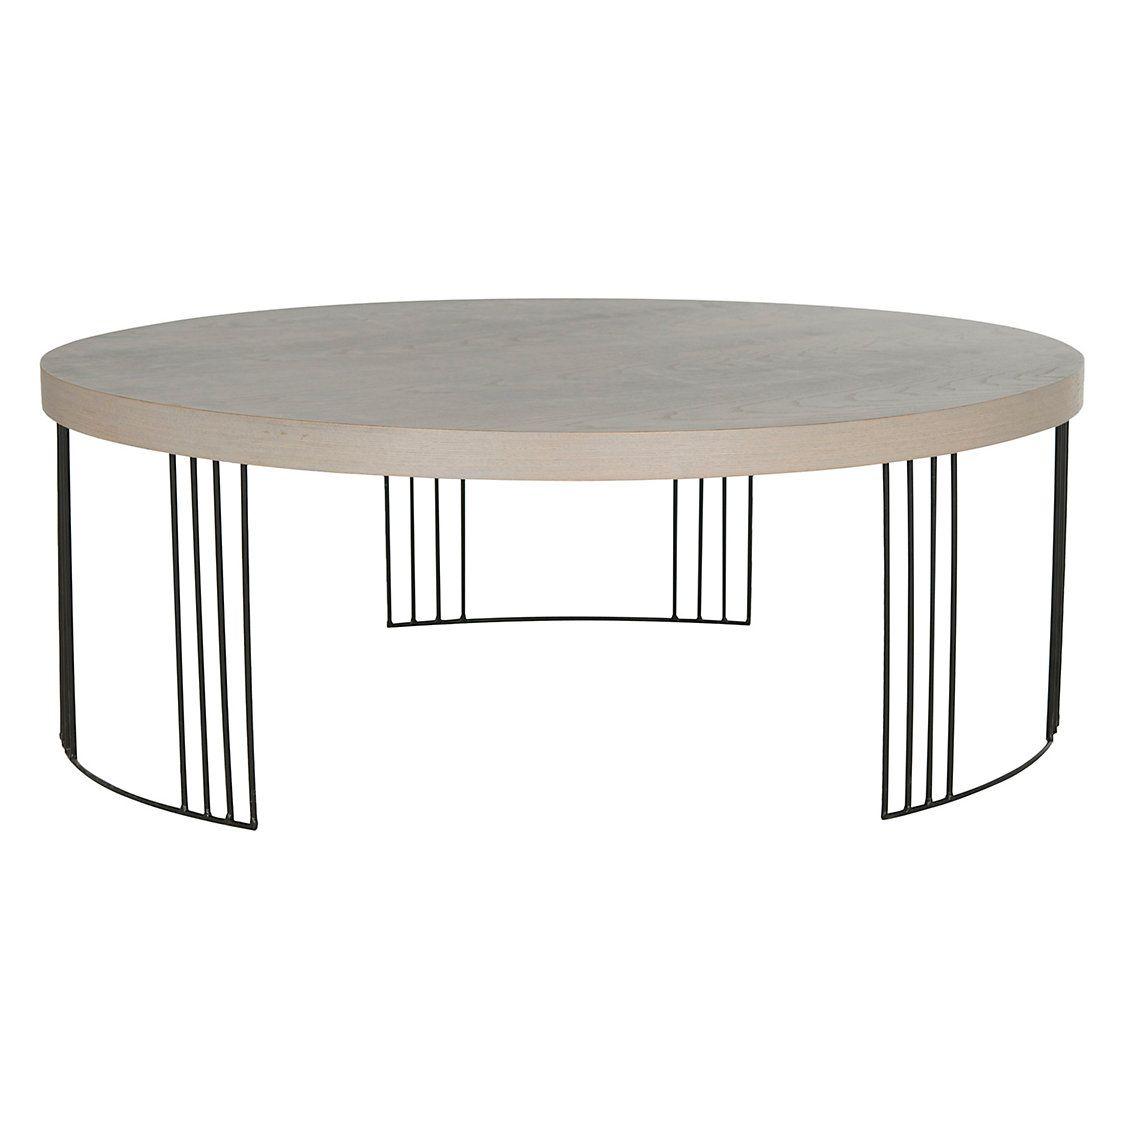 Safavieh Keelin Coffee Table Grey Wood Coffee Table Round Coffee Table Black Coffee Tables